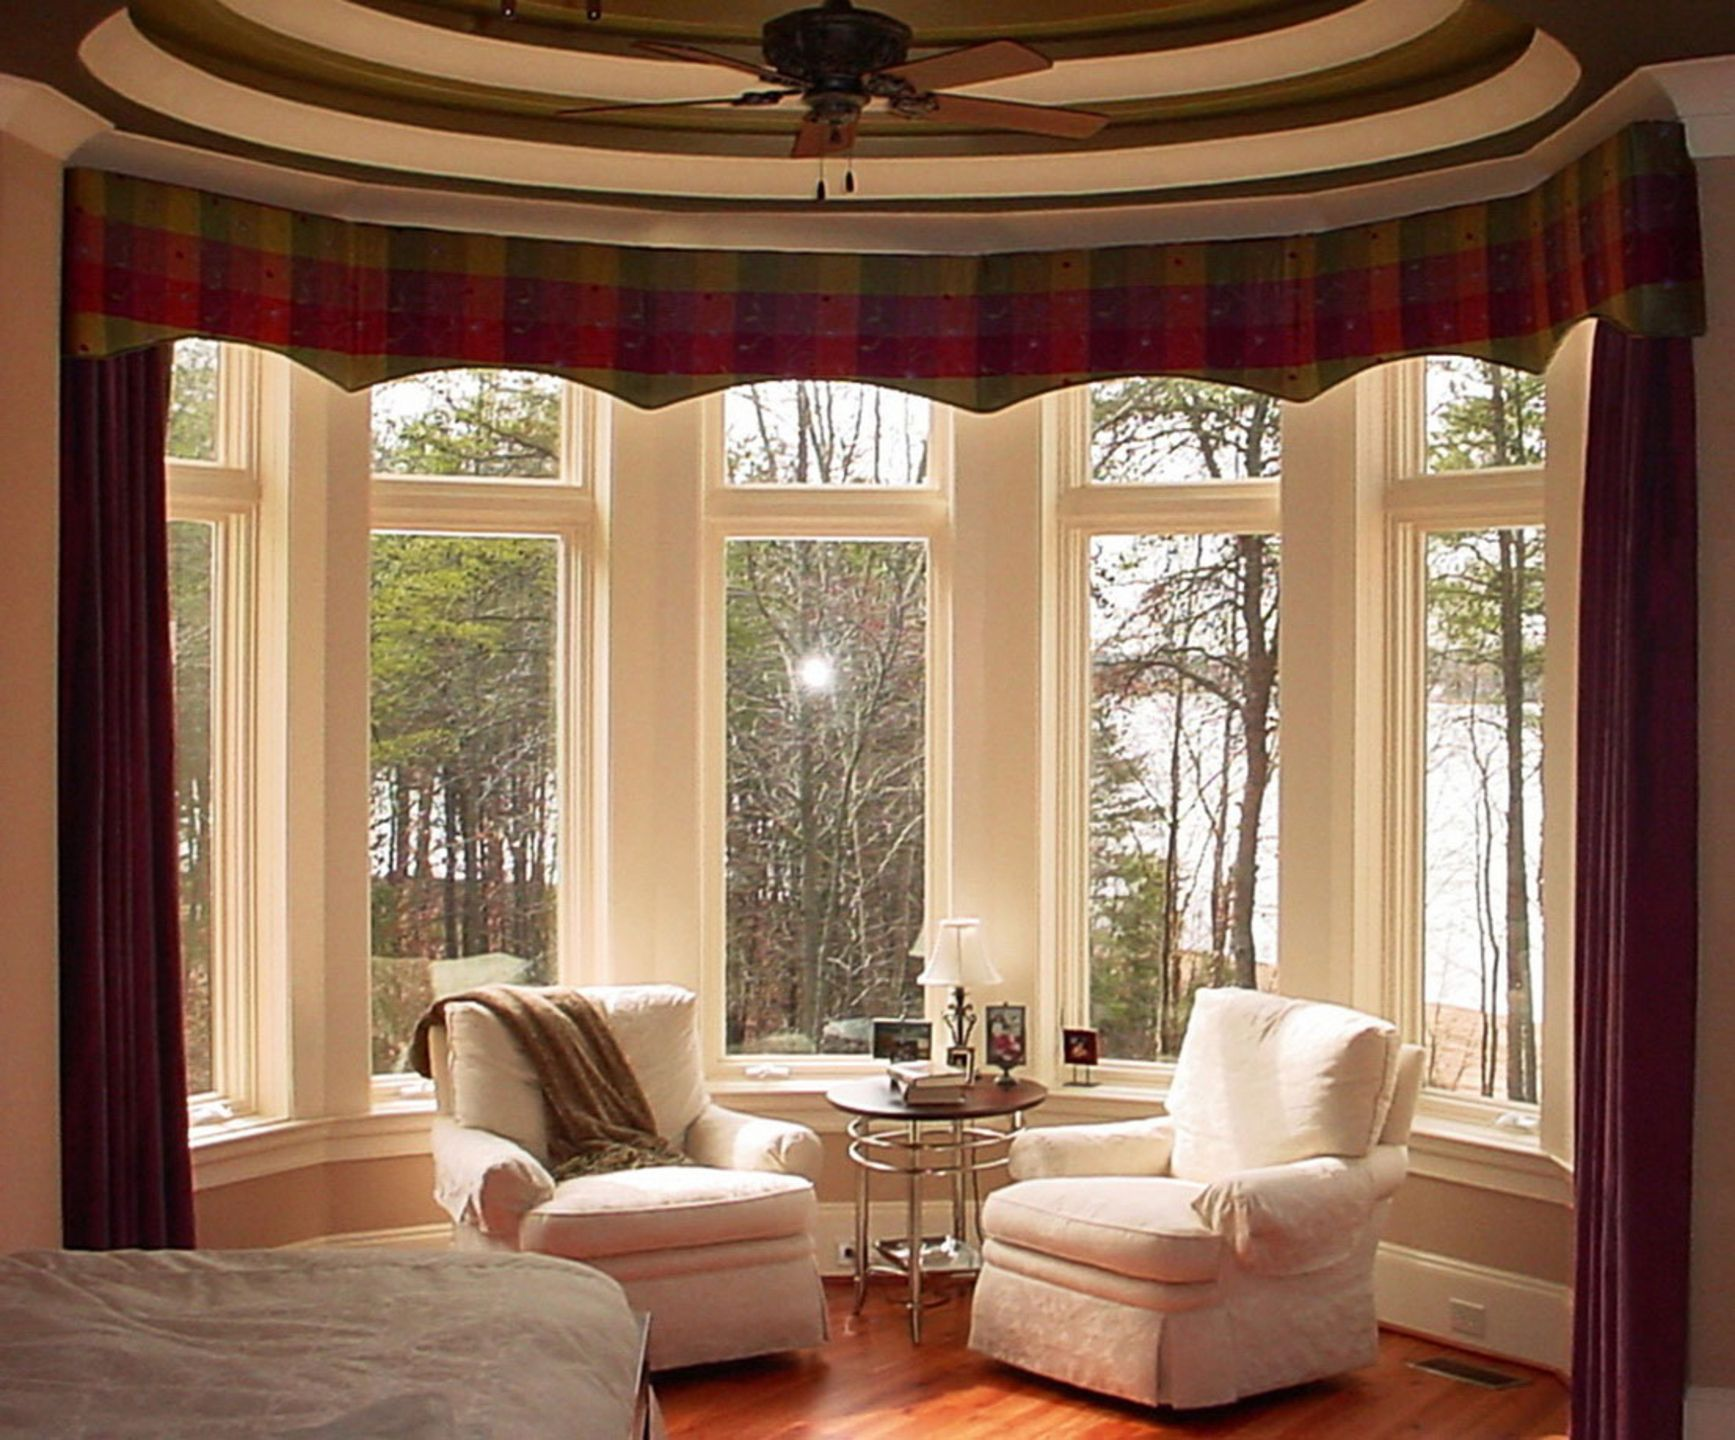 pinpanama aims on fenster | pinterest | best living room